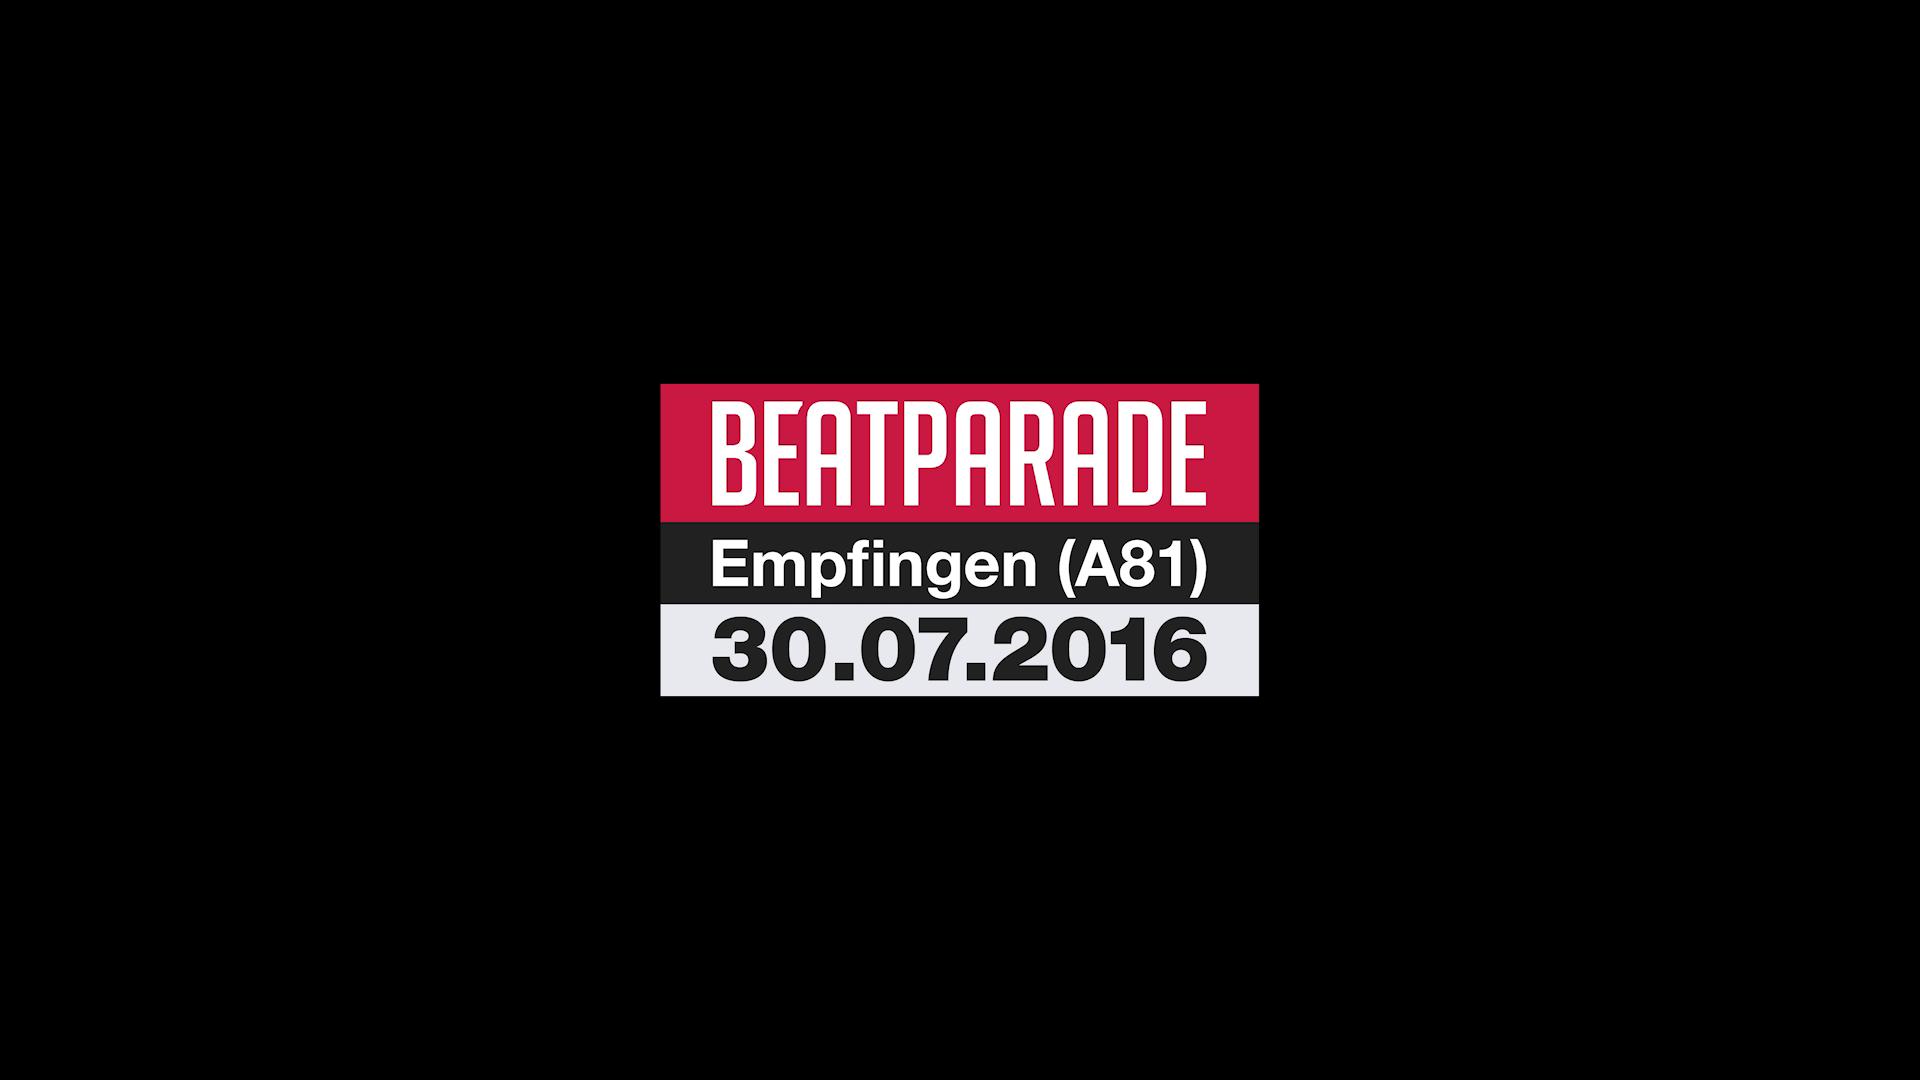 BEATPARADE 2016 - OFFICIAL AFTERMOVIE